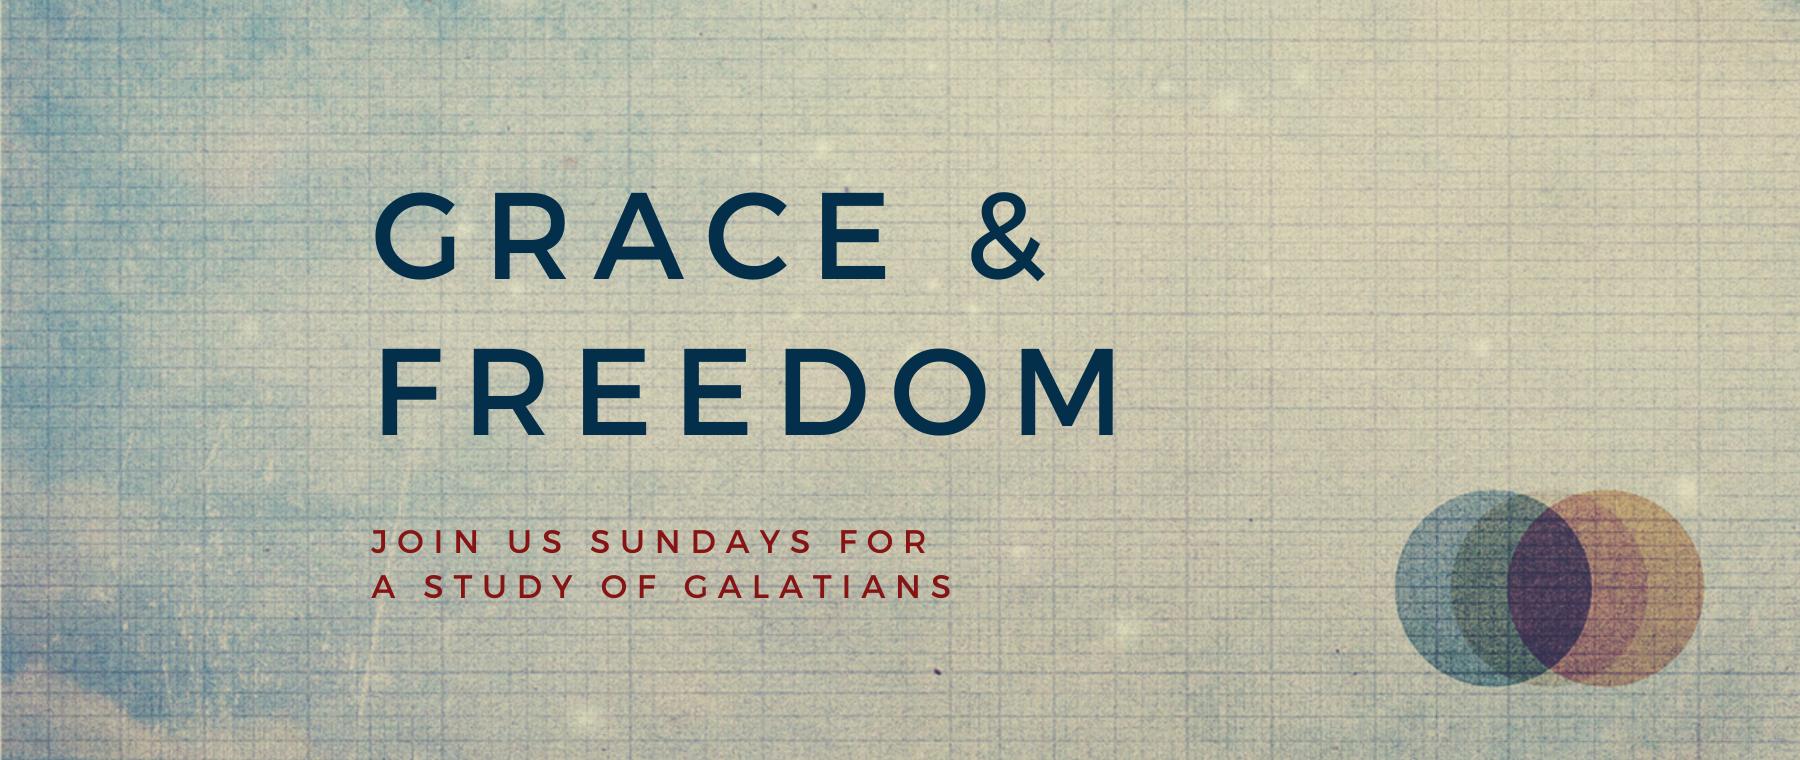 Grace & Freedom